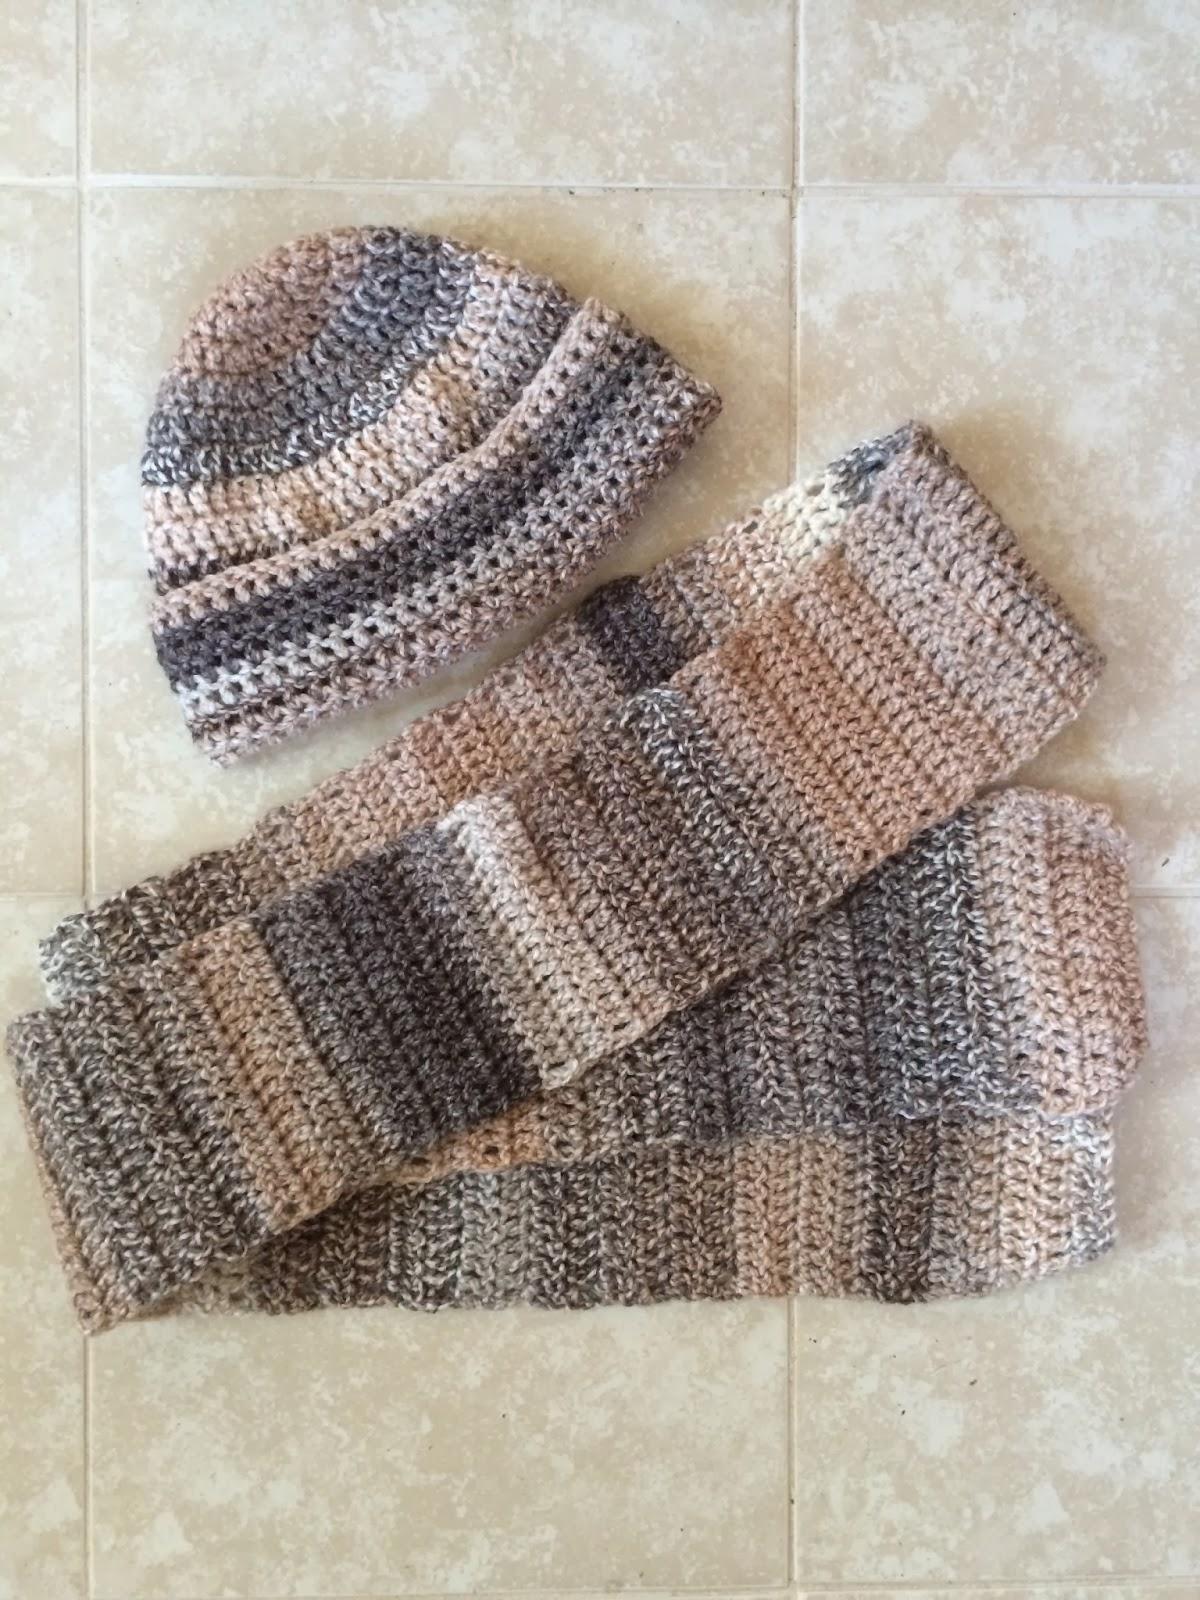 Crochet Men\'s Manly Man Hat and Scarf Set | Not My Nana\'s Crochet!